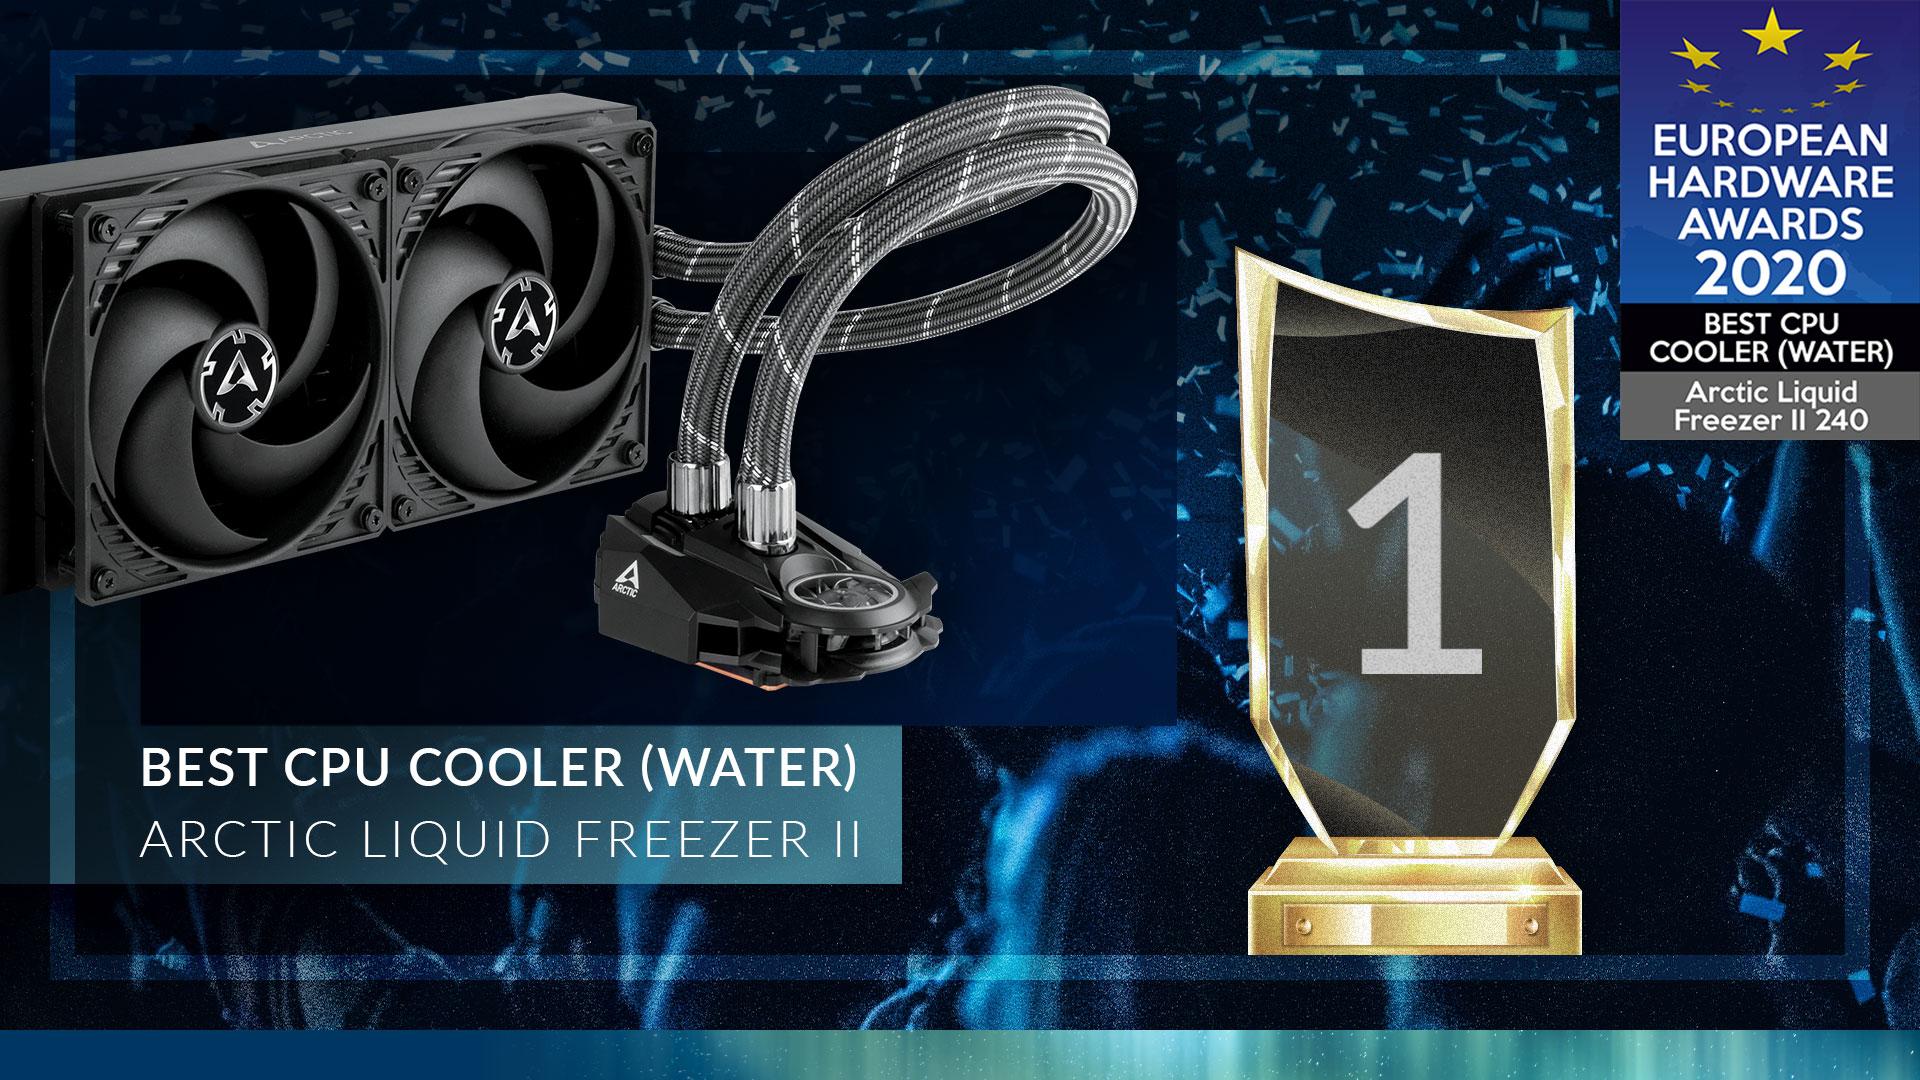 LFII_European_Hardware_Award